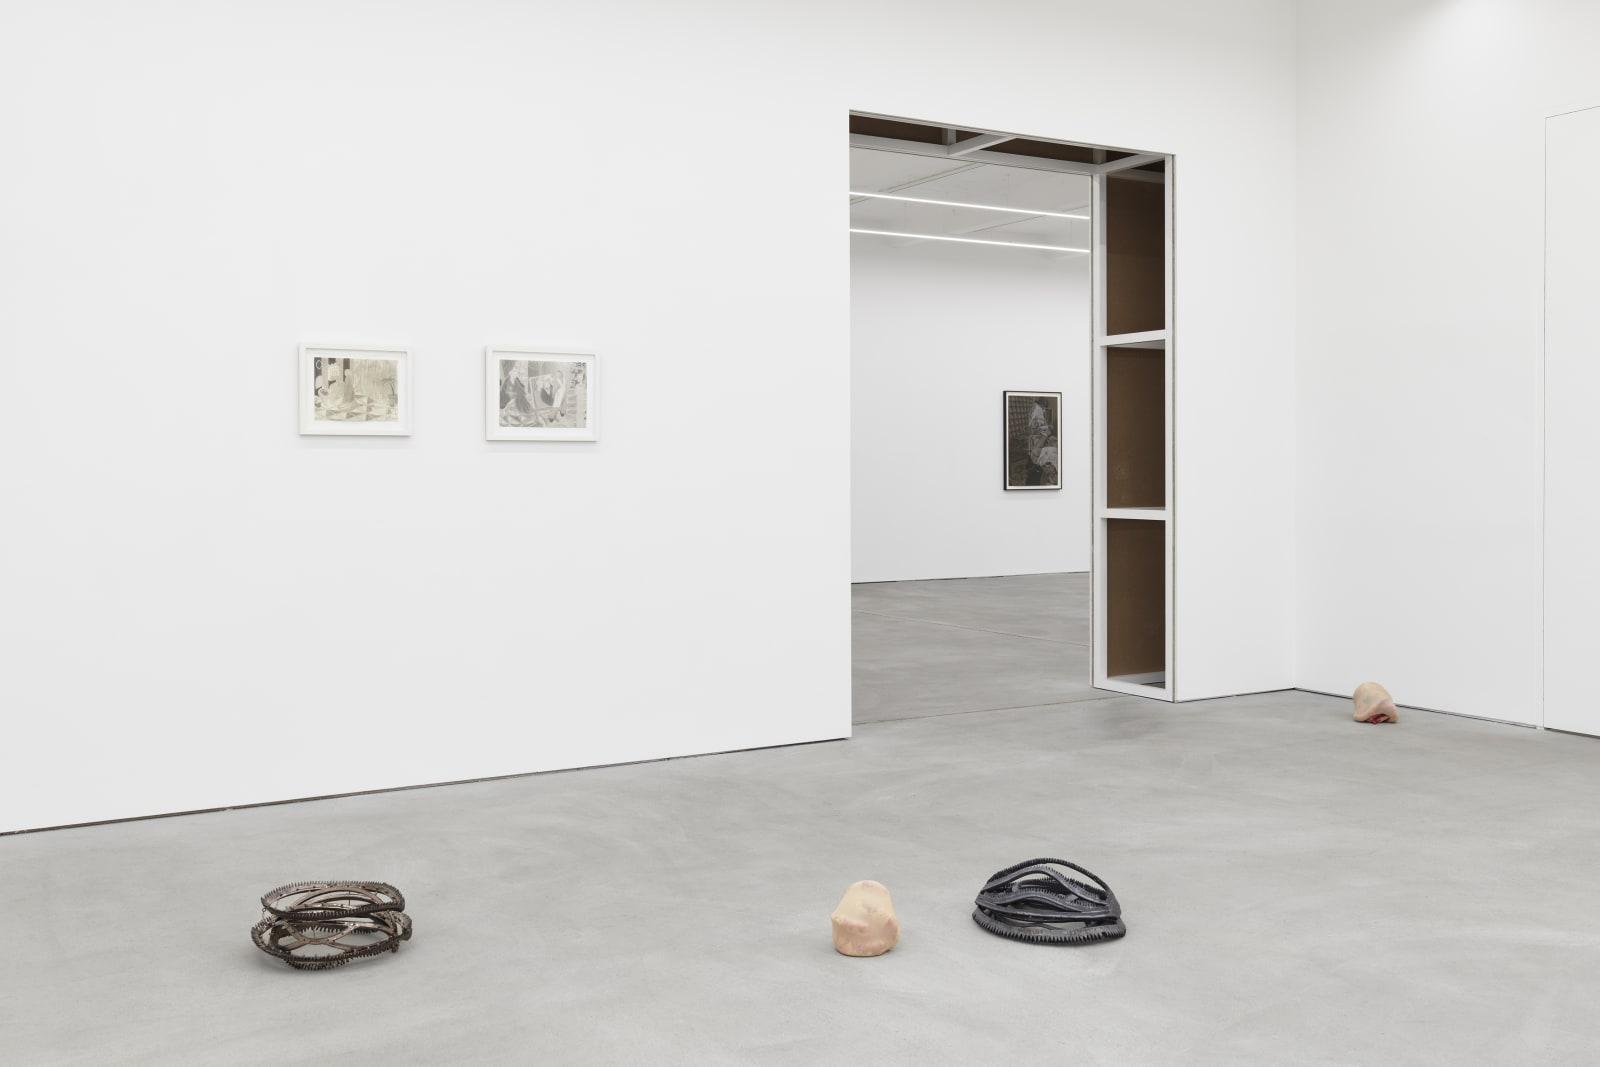 KYUNG-ME, HANNA-MARIA HAMMARI, MAINA-MIRIAM MUNSKY exhibition view, Liminal States, Kraupa-Tuskany Zeidler, Berlin 2019-2020